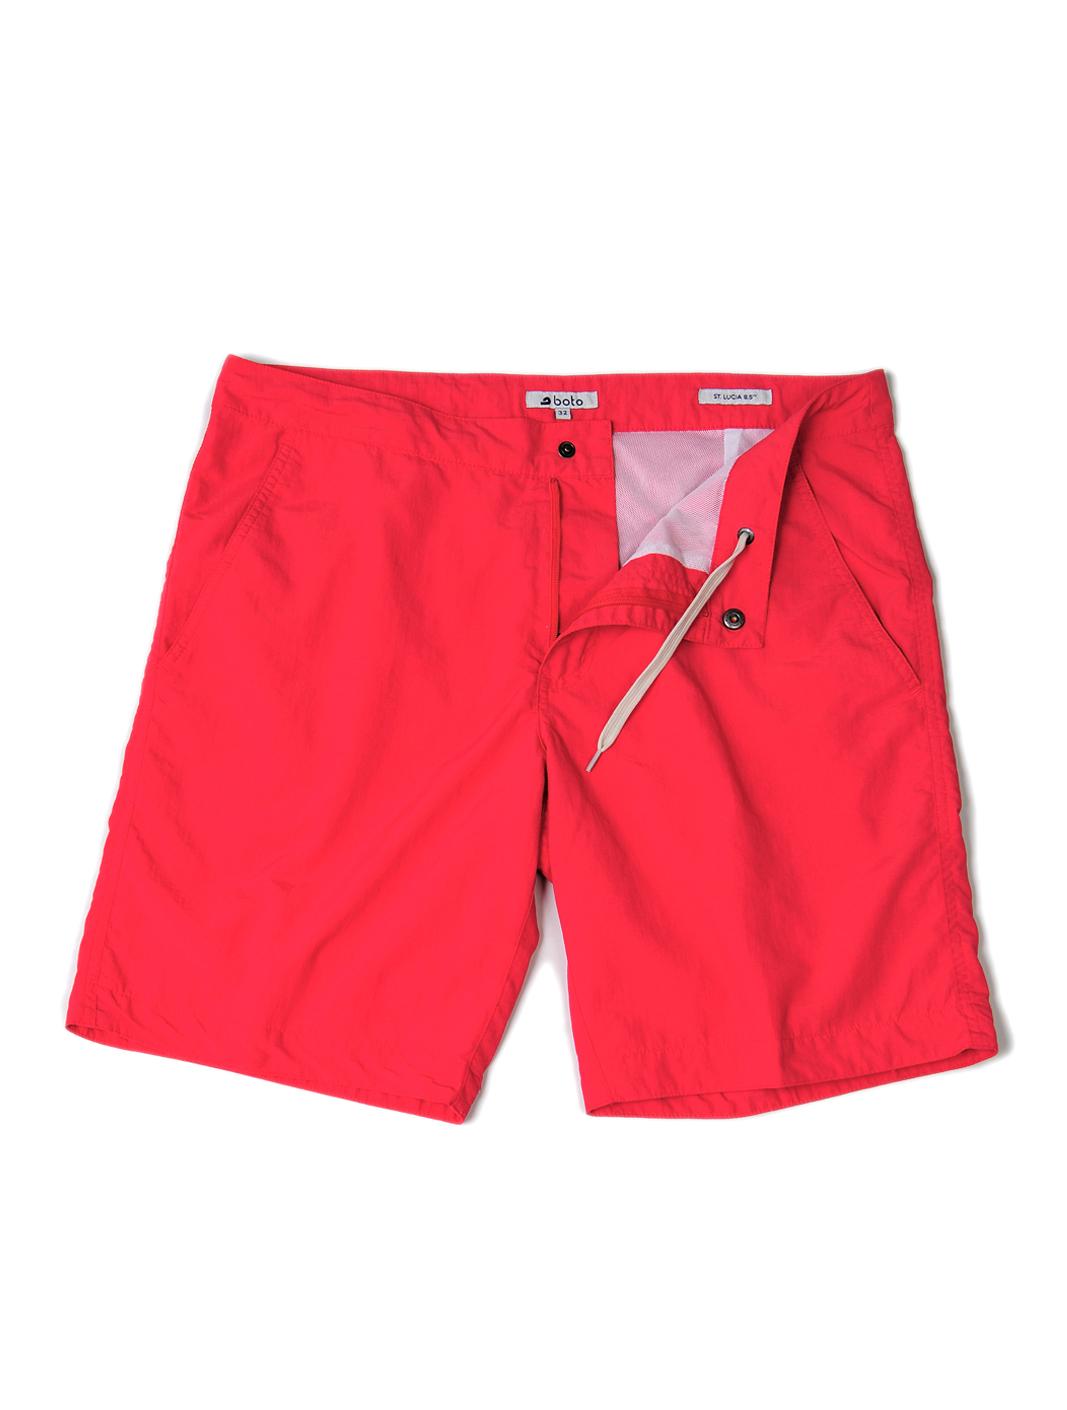 Coral Red Boto Swim Shorts